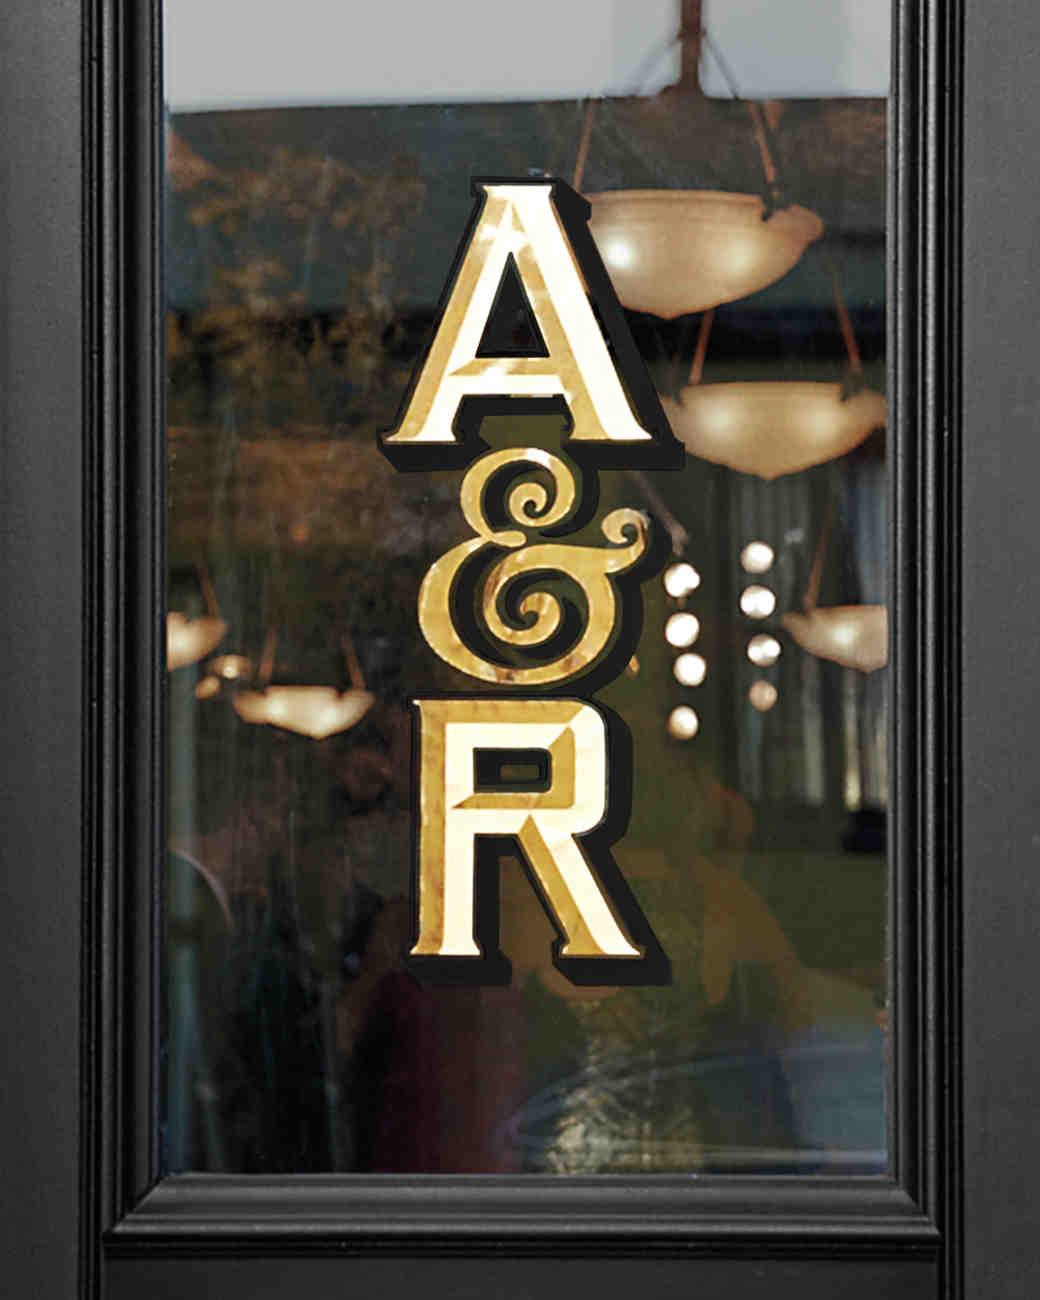 rw-anthony-rusty-front-door-1354-01111-wd110176.jpg